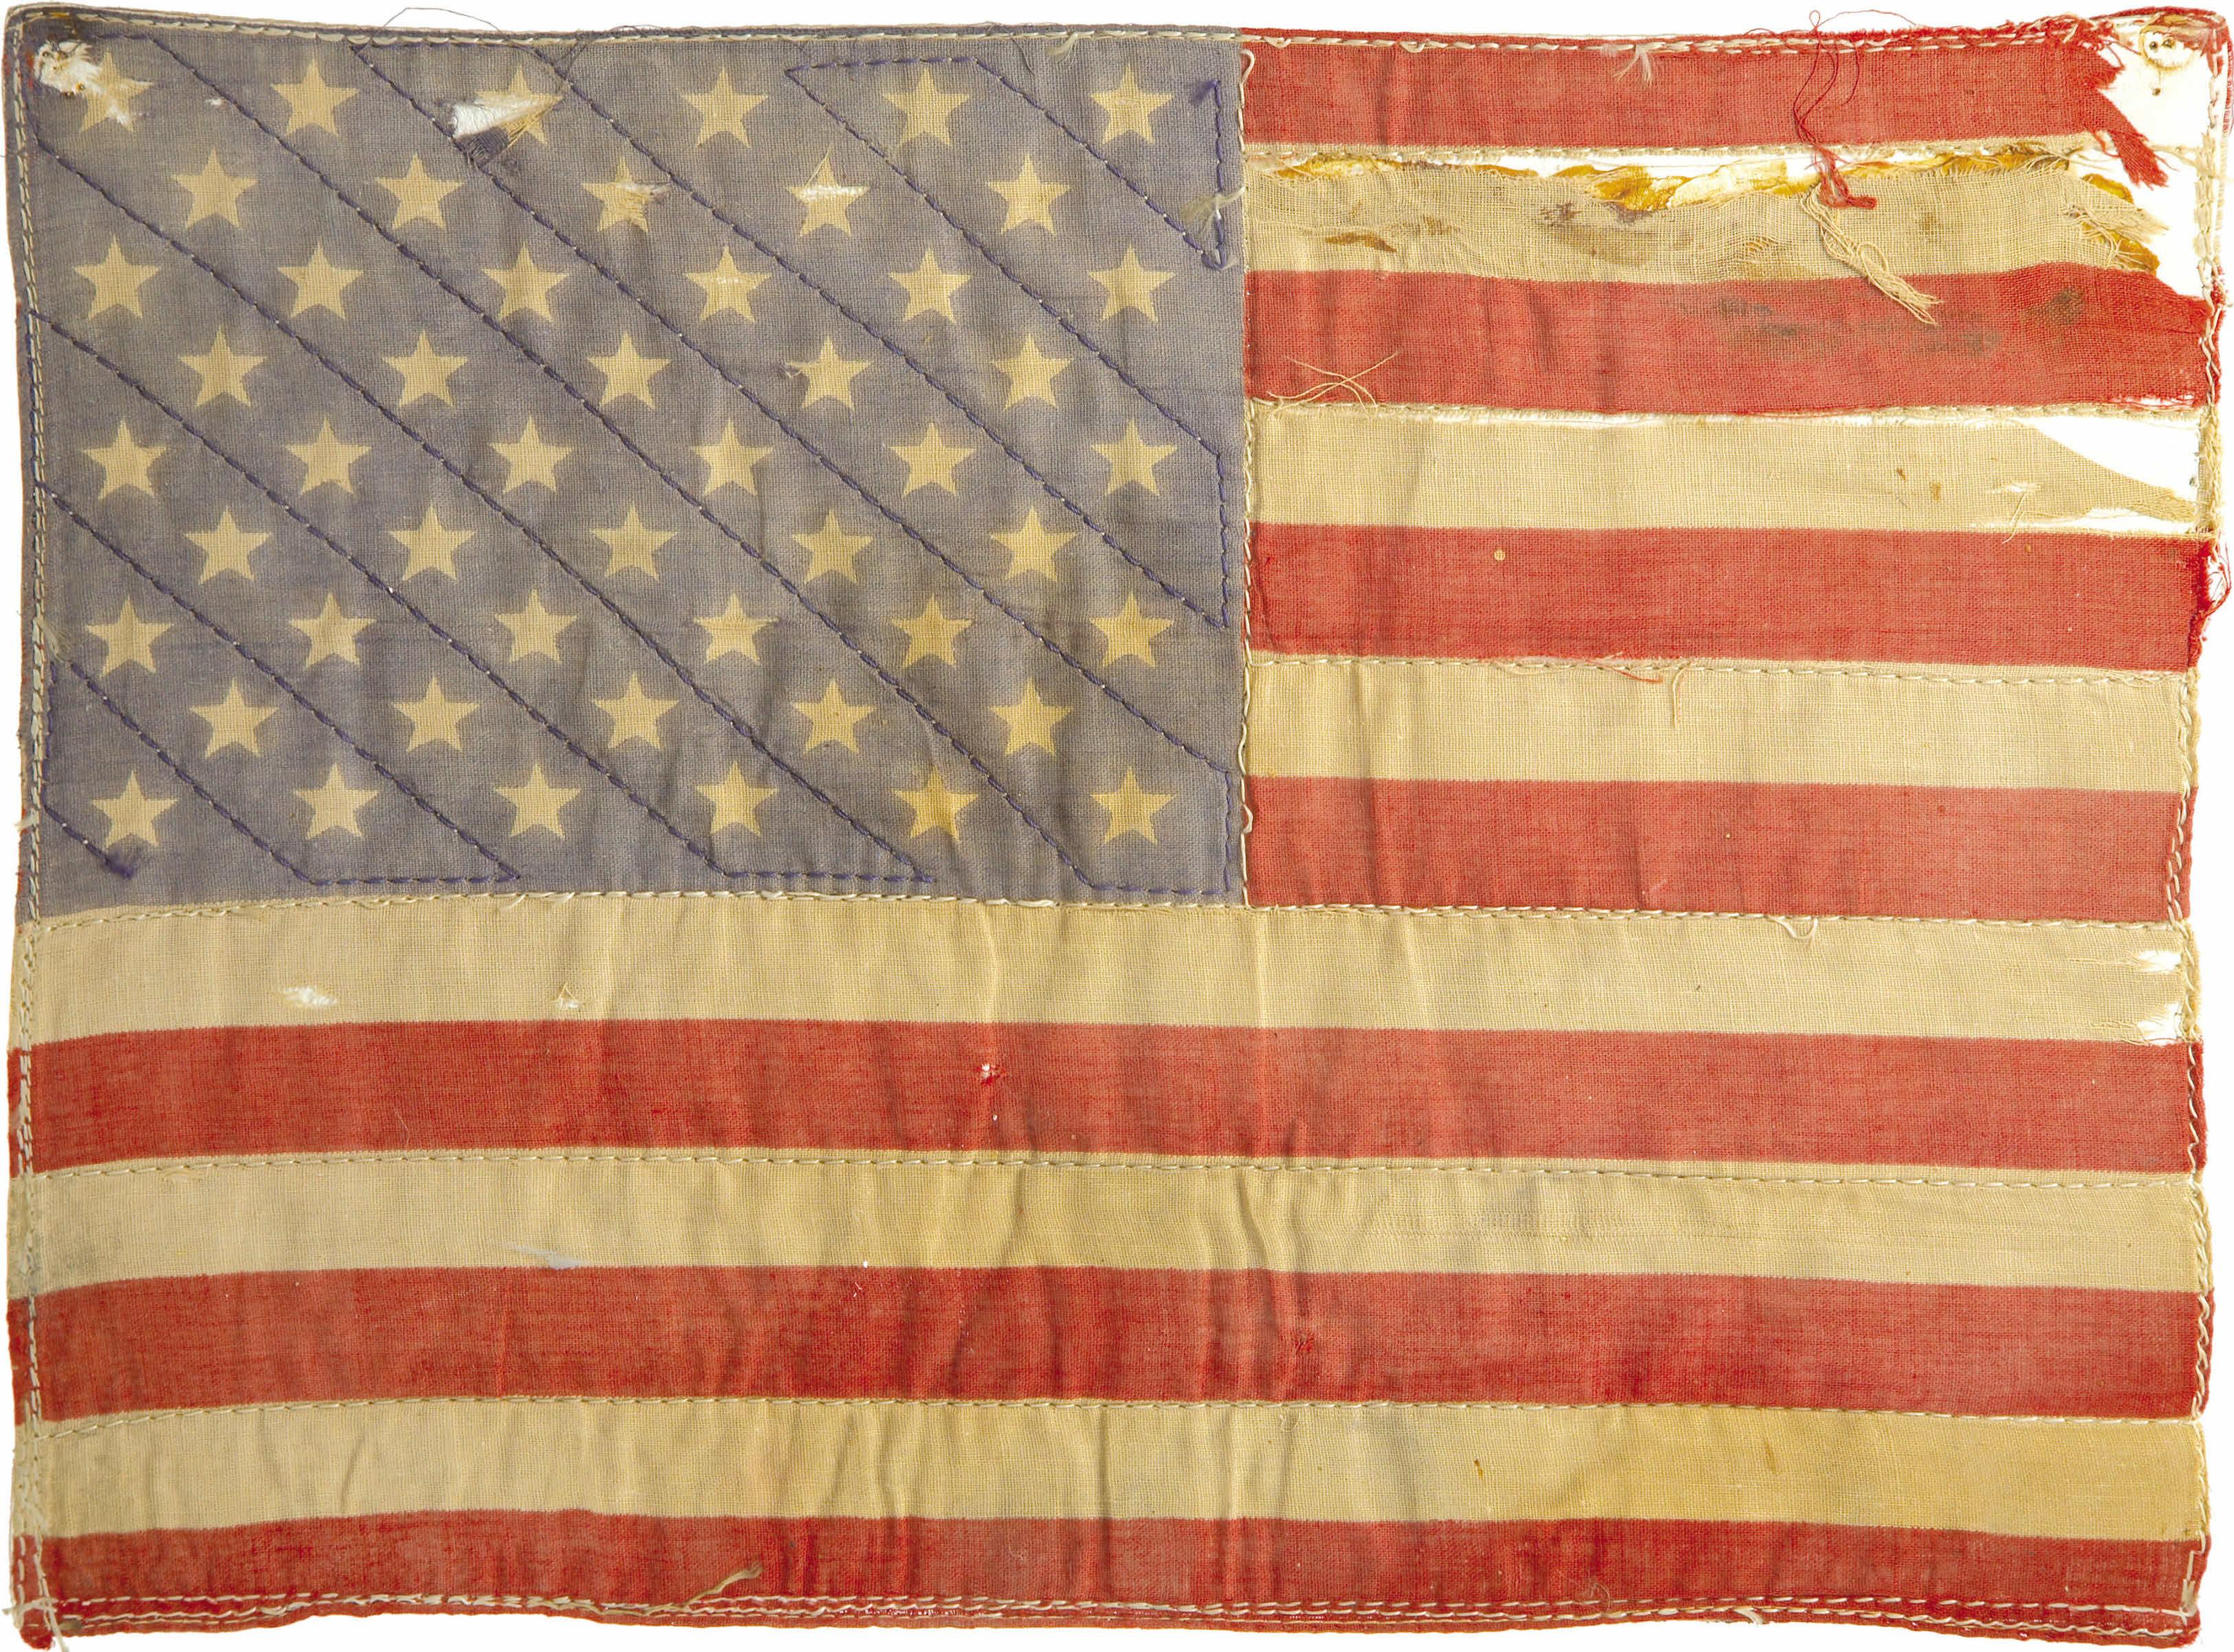 First amendment flag burning